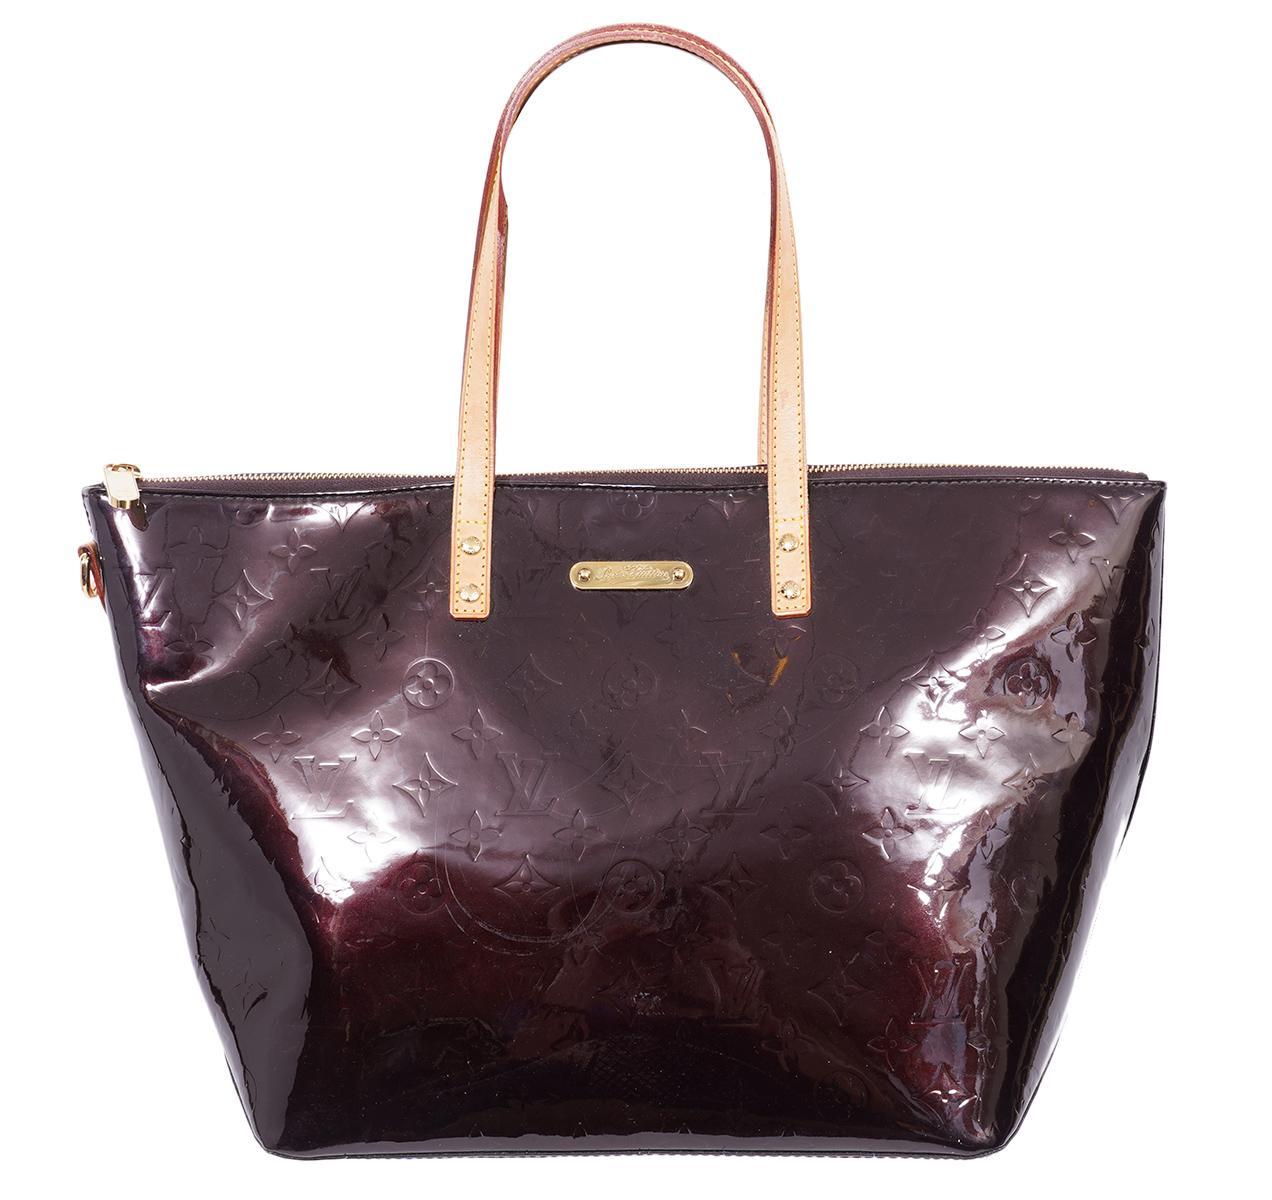 Louis Vuitton Amaranth Vernis Bellevue Tote